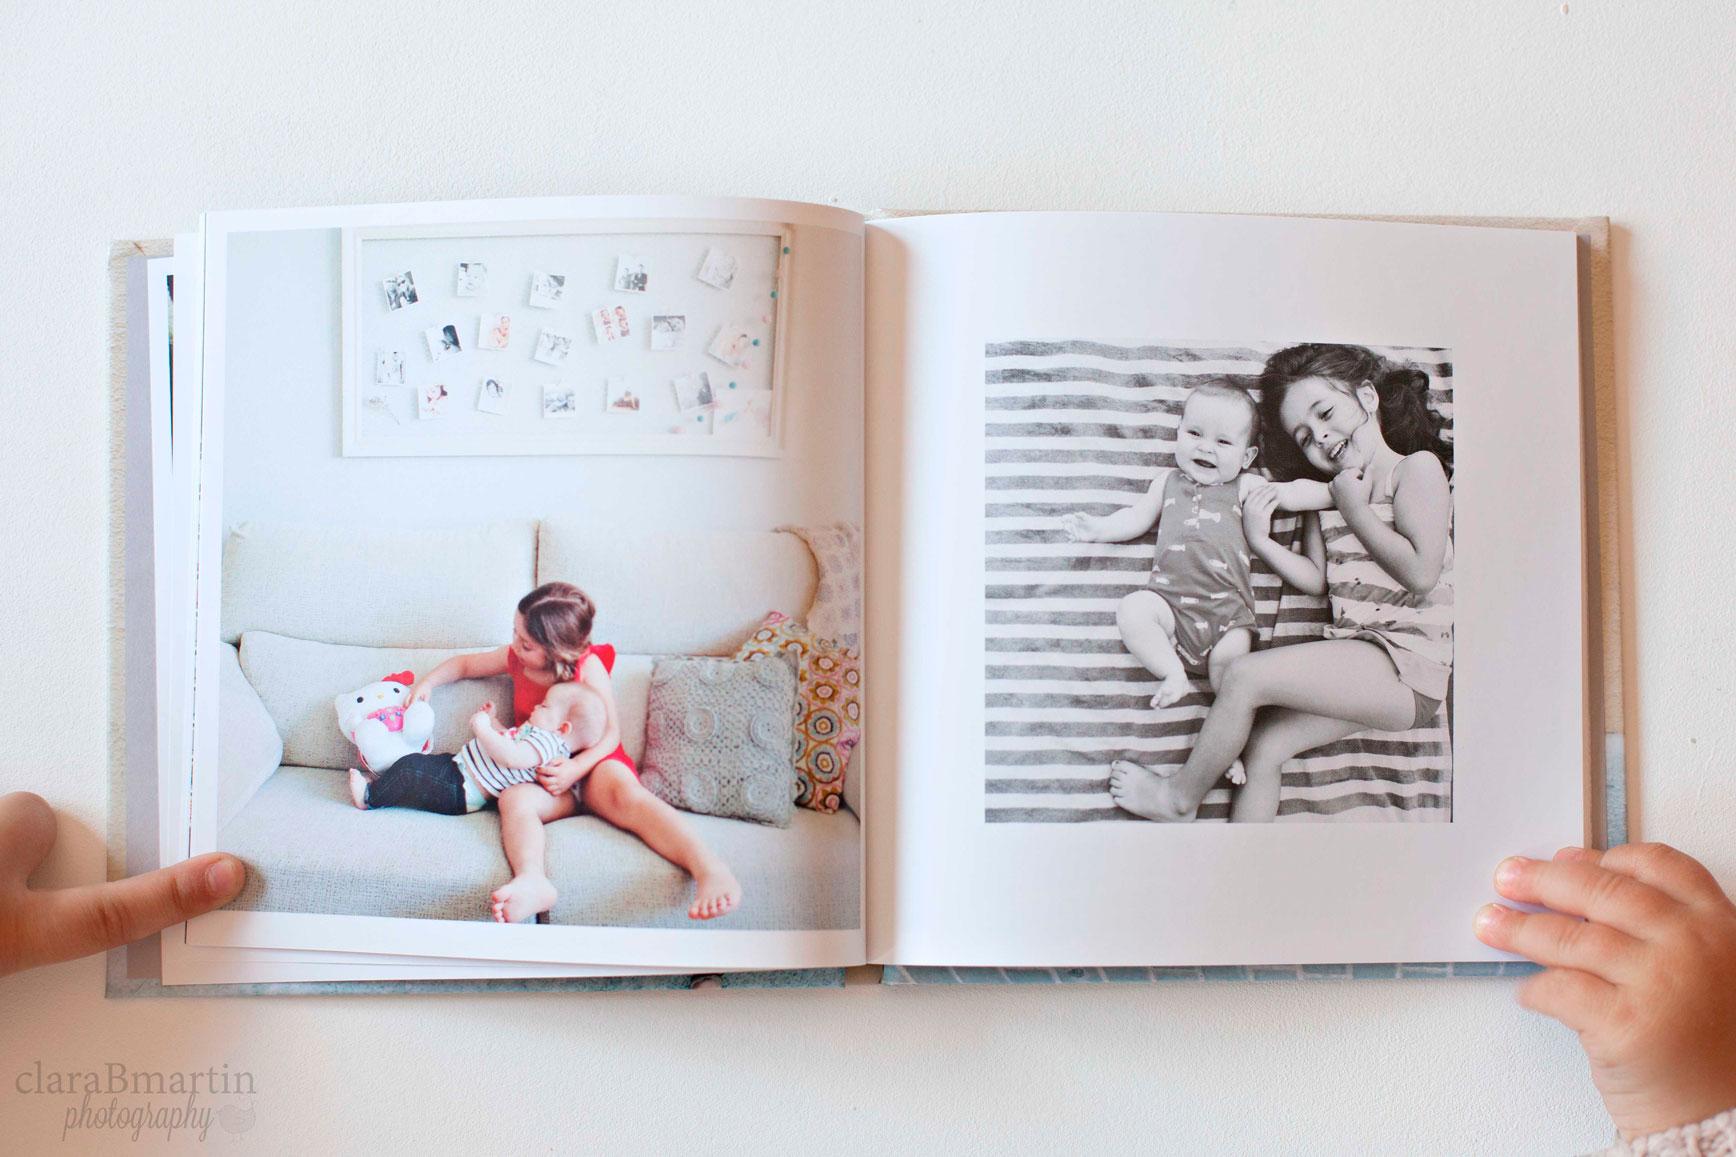 Libro_Instagram_claraBmartin_05